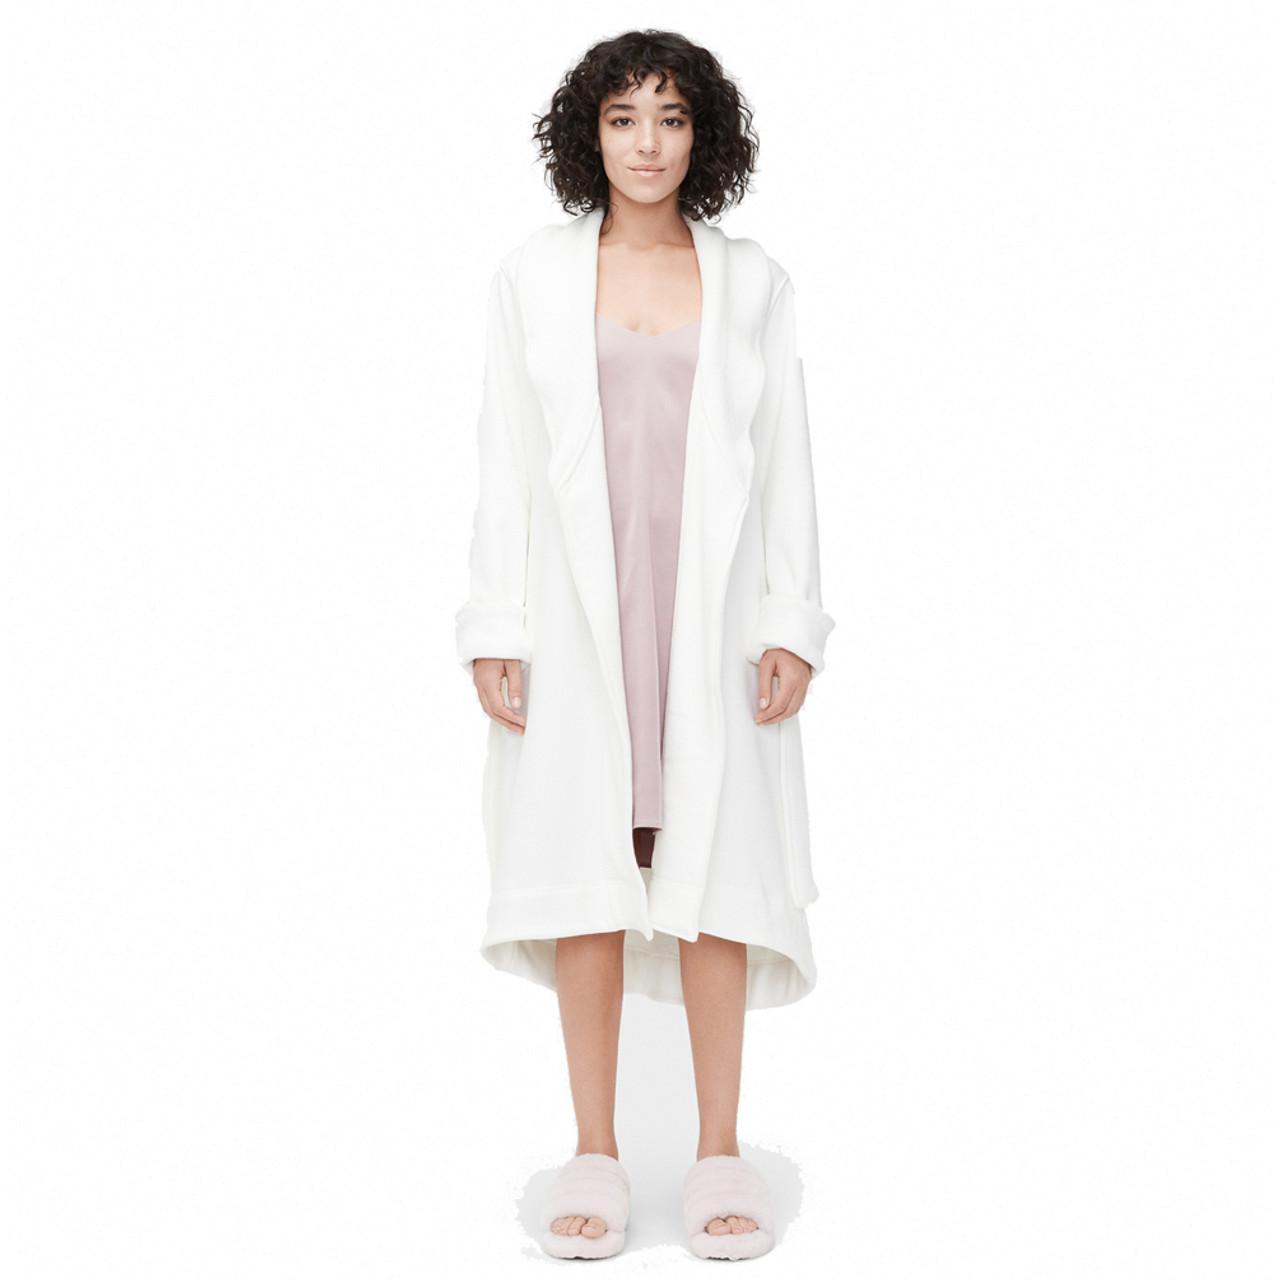 06881be9a68 UGG Women's Duffield II Robe Cream